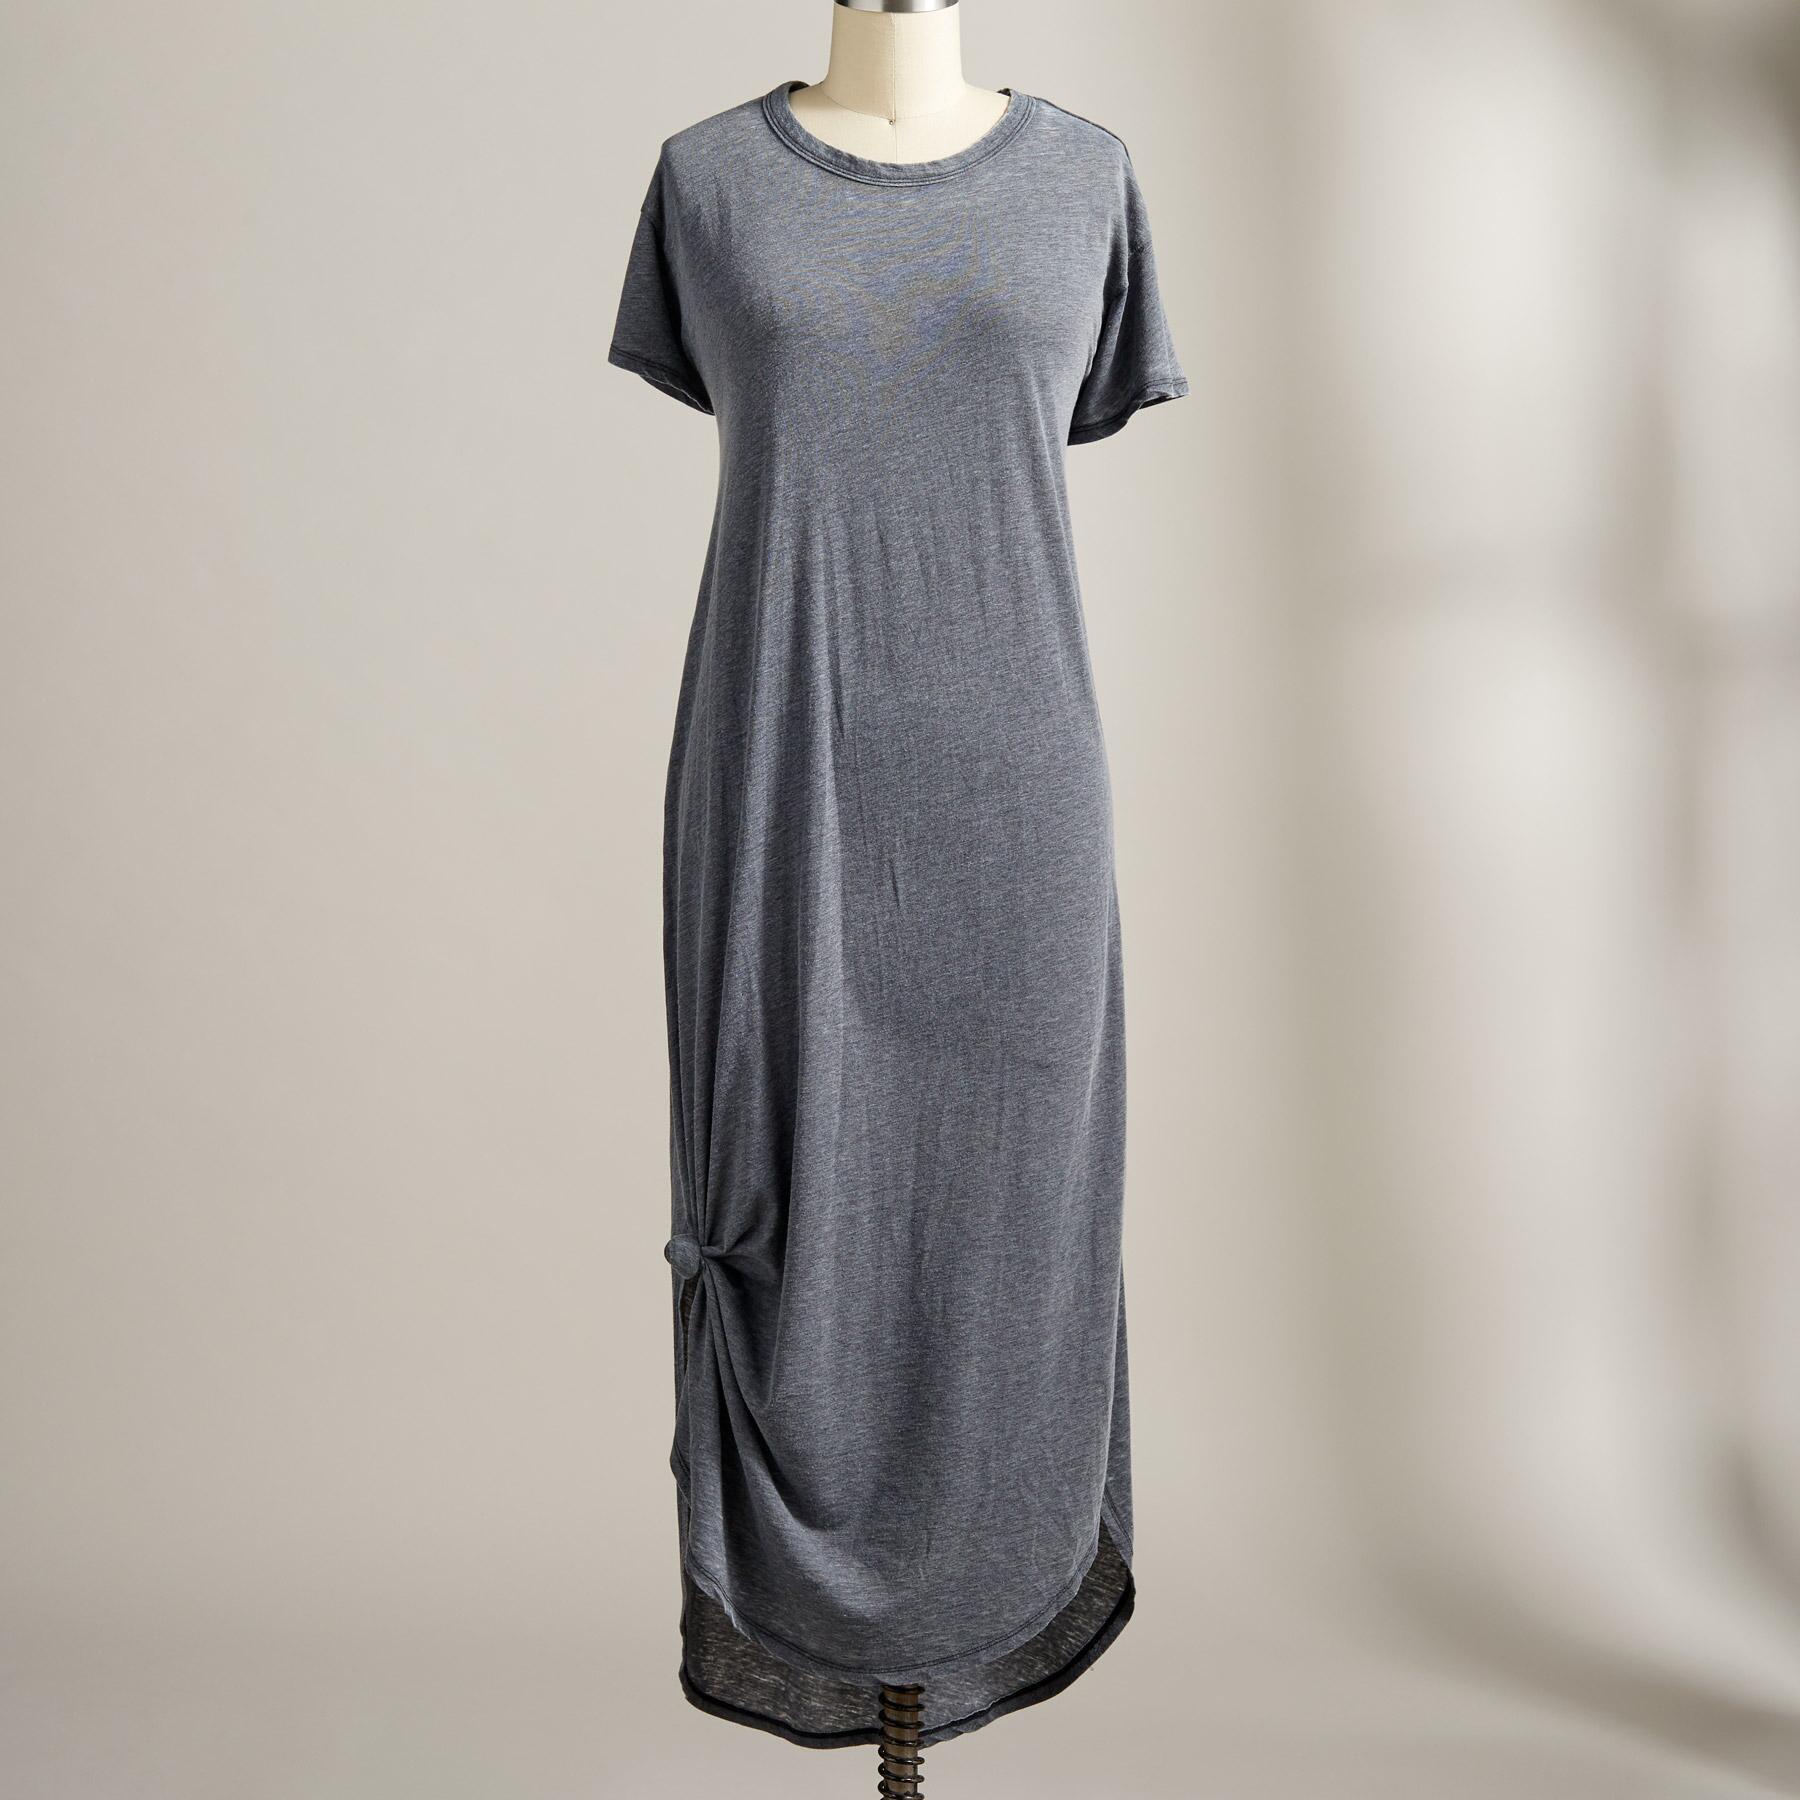 carlie casual dress from Sundance